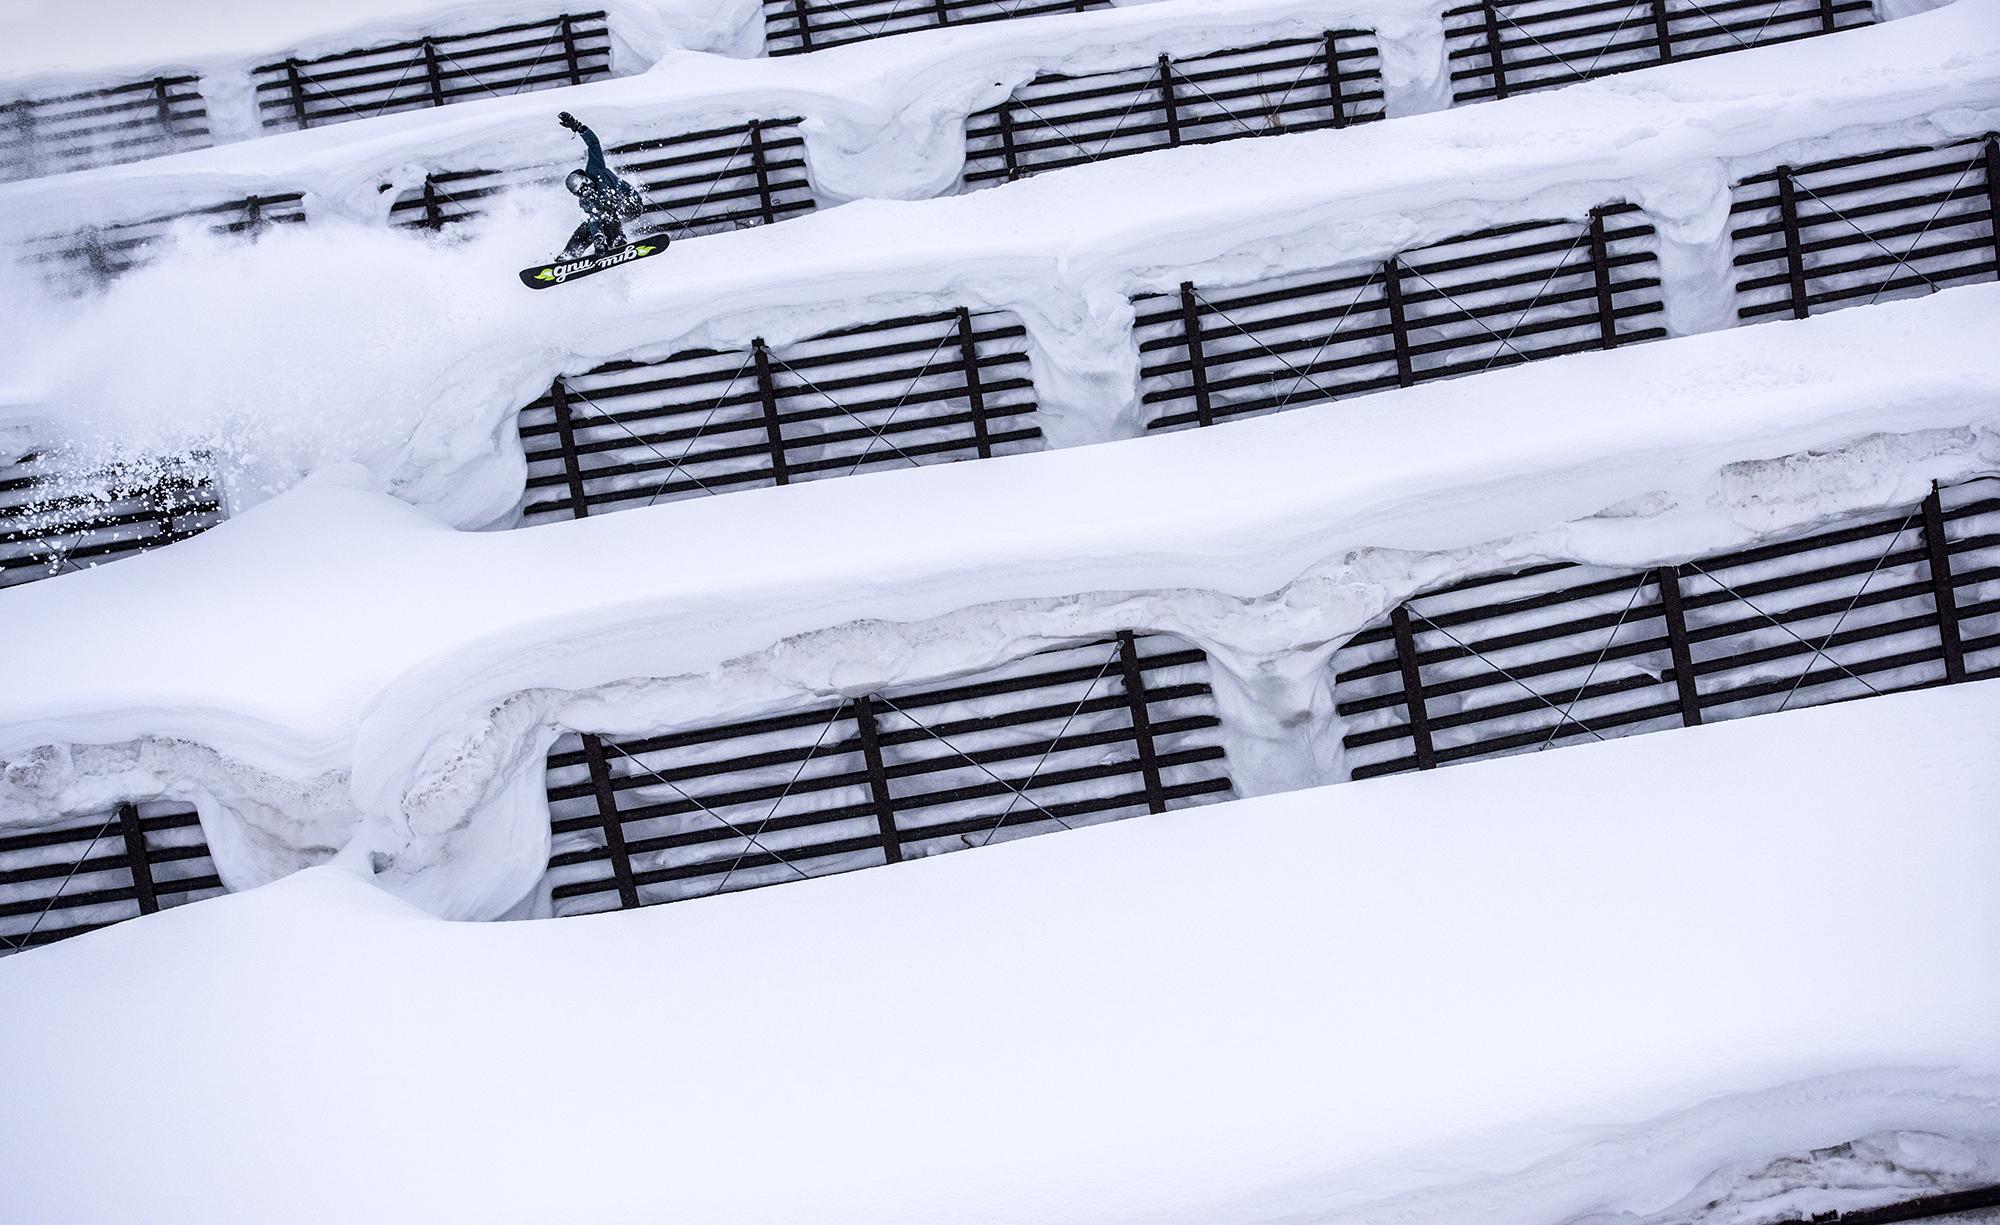 Blake Paul. Hokkaido, Japan. Photography by Tim Kemple.